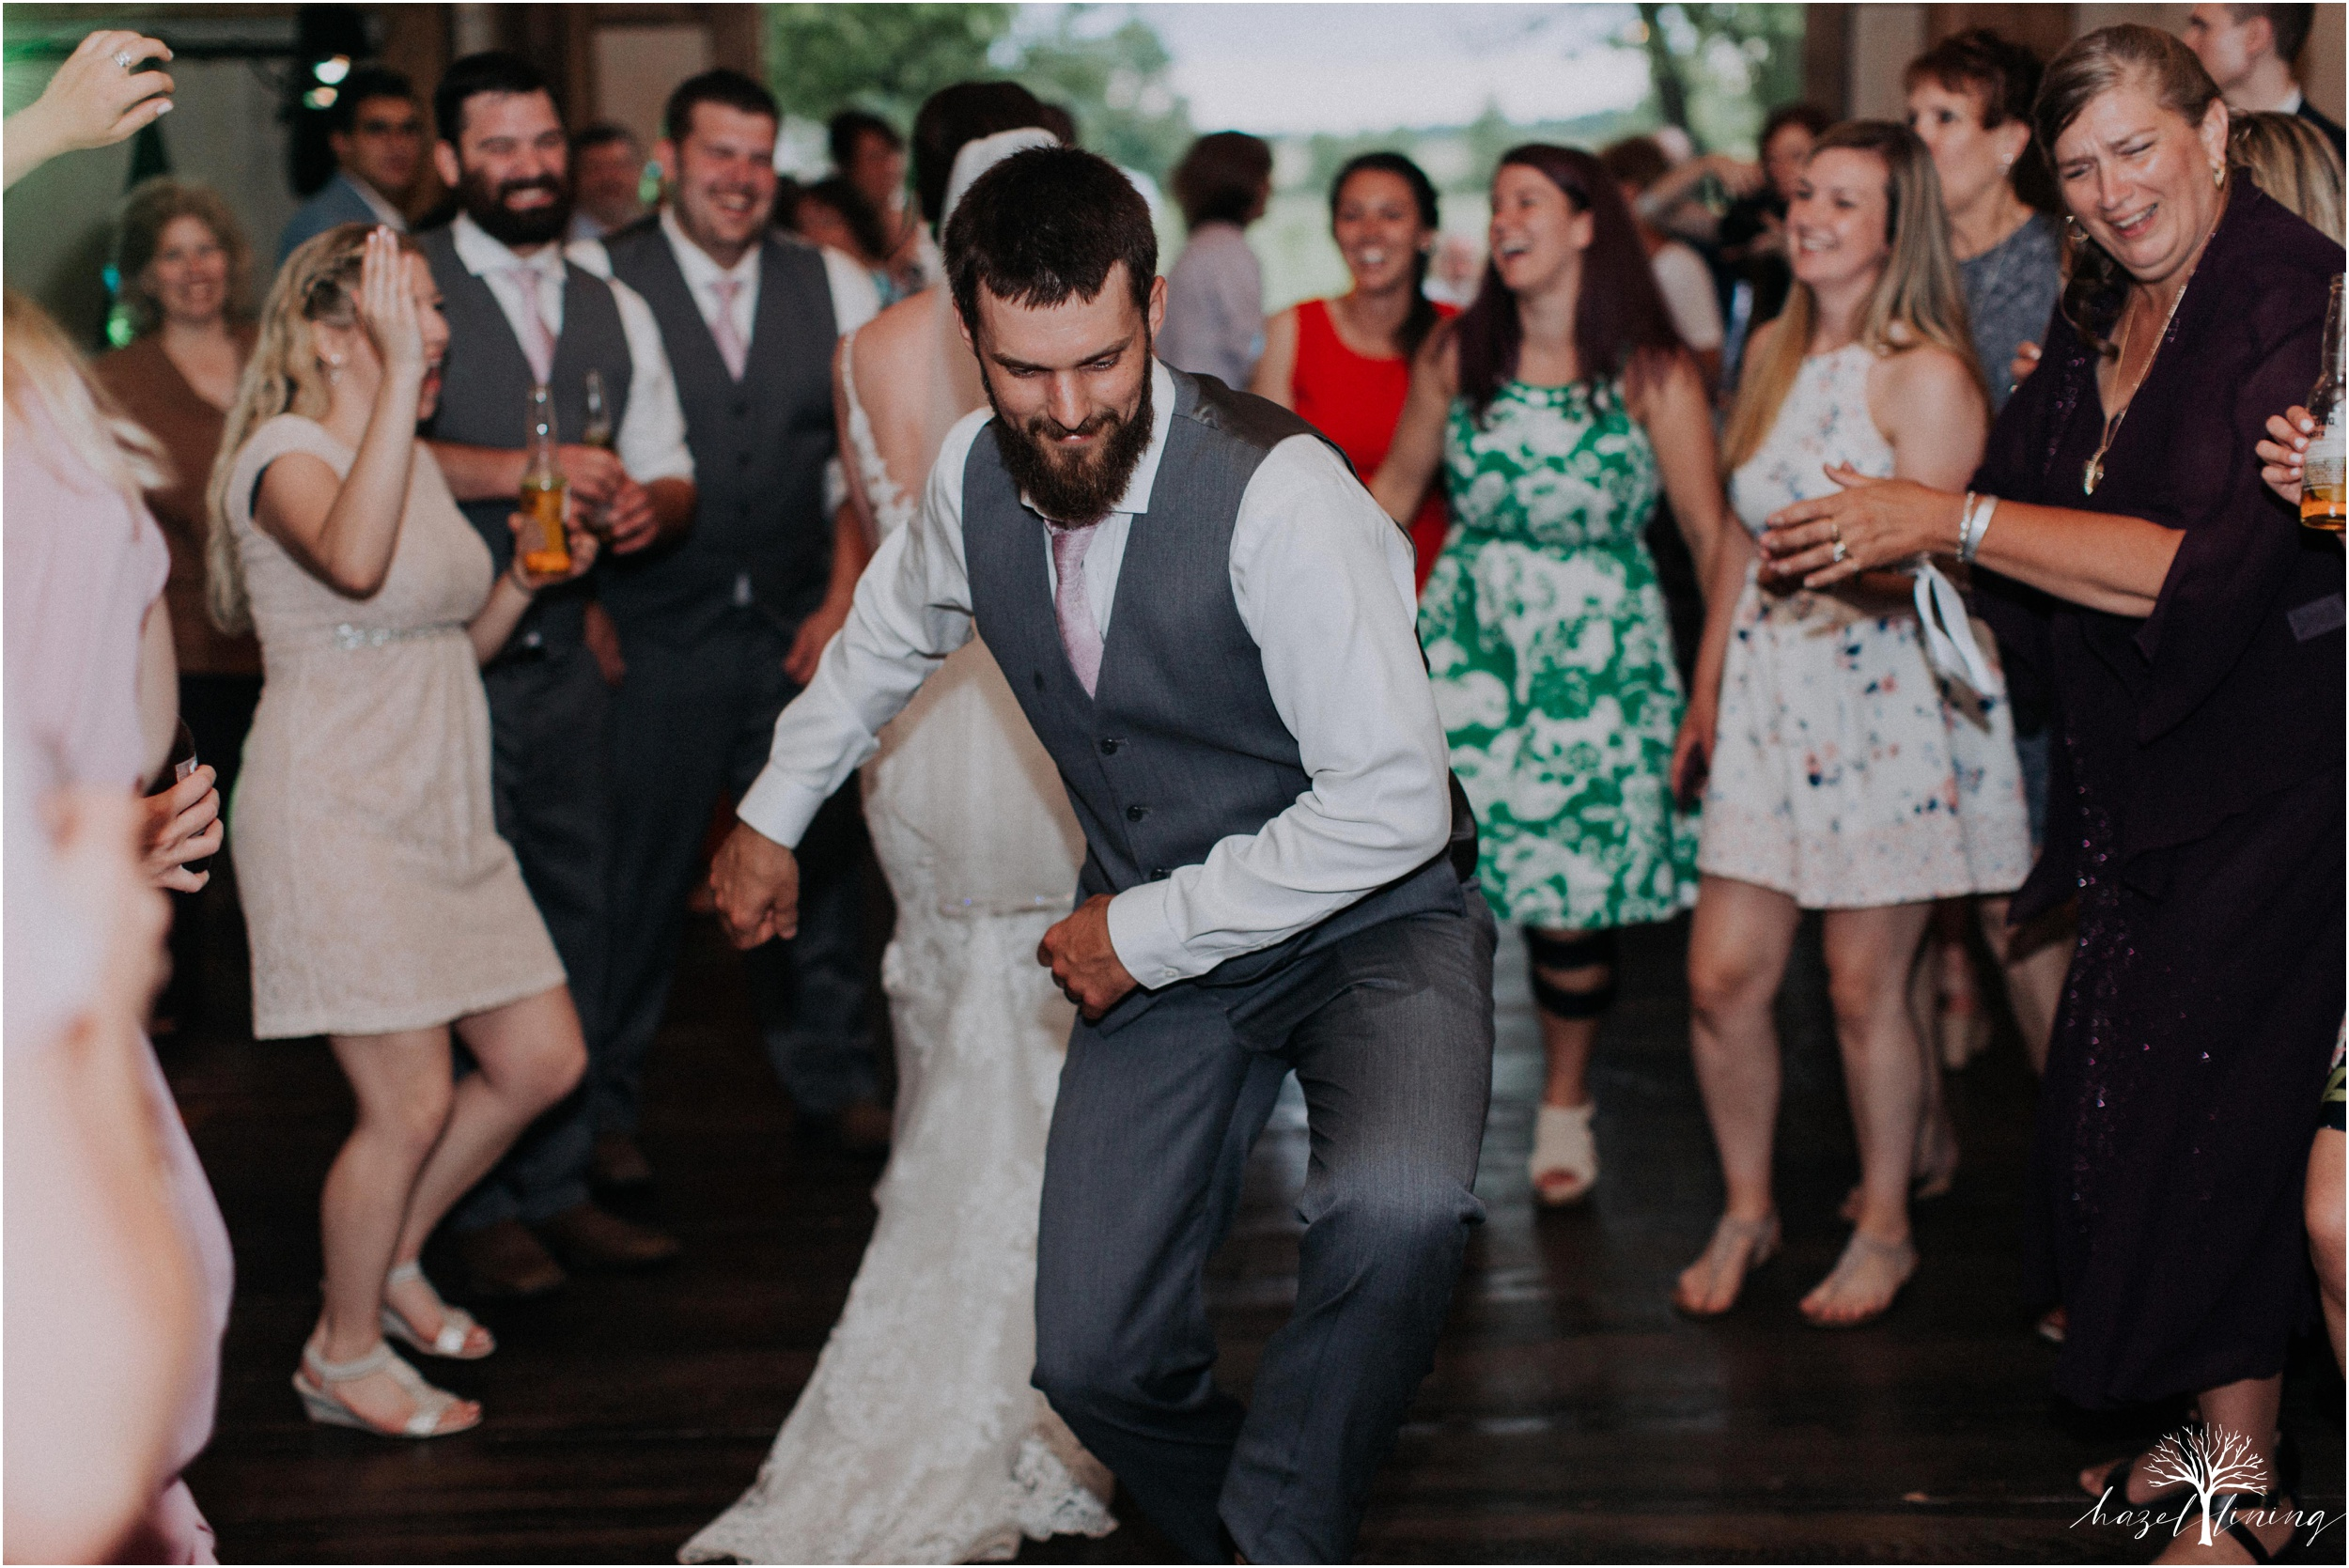 hazel-lining-travel-wedding-elopement-photography-lisa-landon-shoemaker-the-farm-bakery-and-events-bucks-county-quakertown-pennsylvania-summer-country-outdoor-farm-wedding_0155.jpg